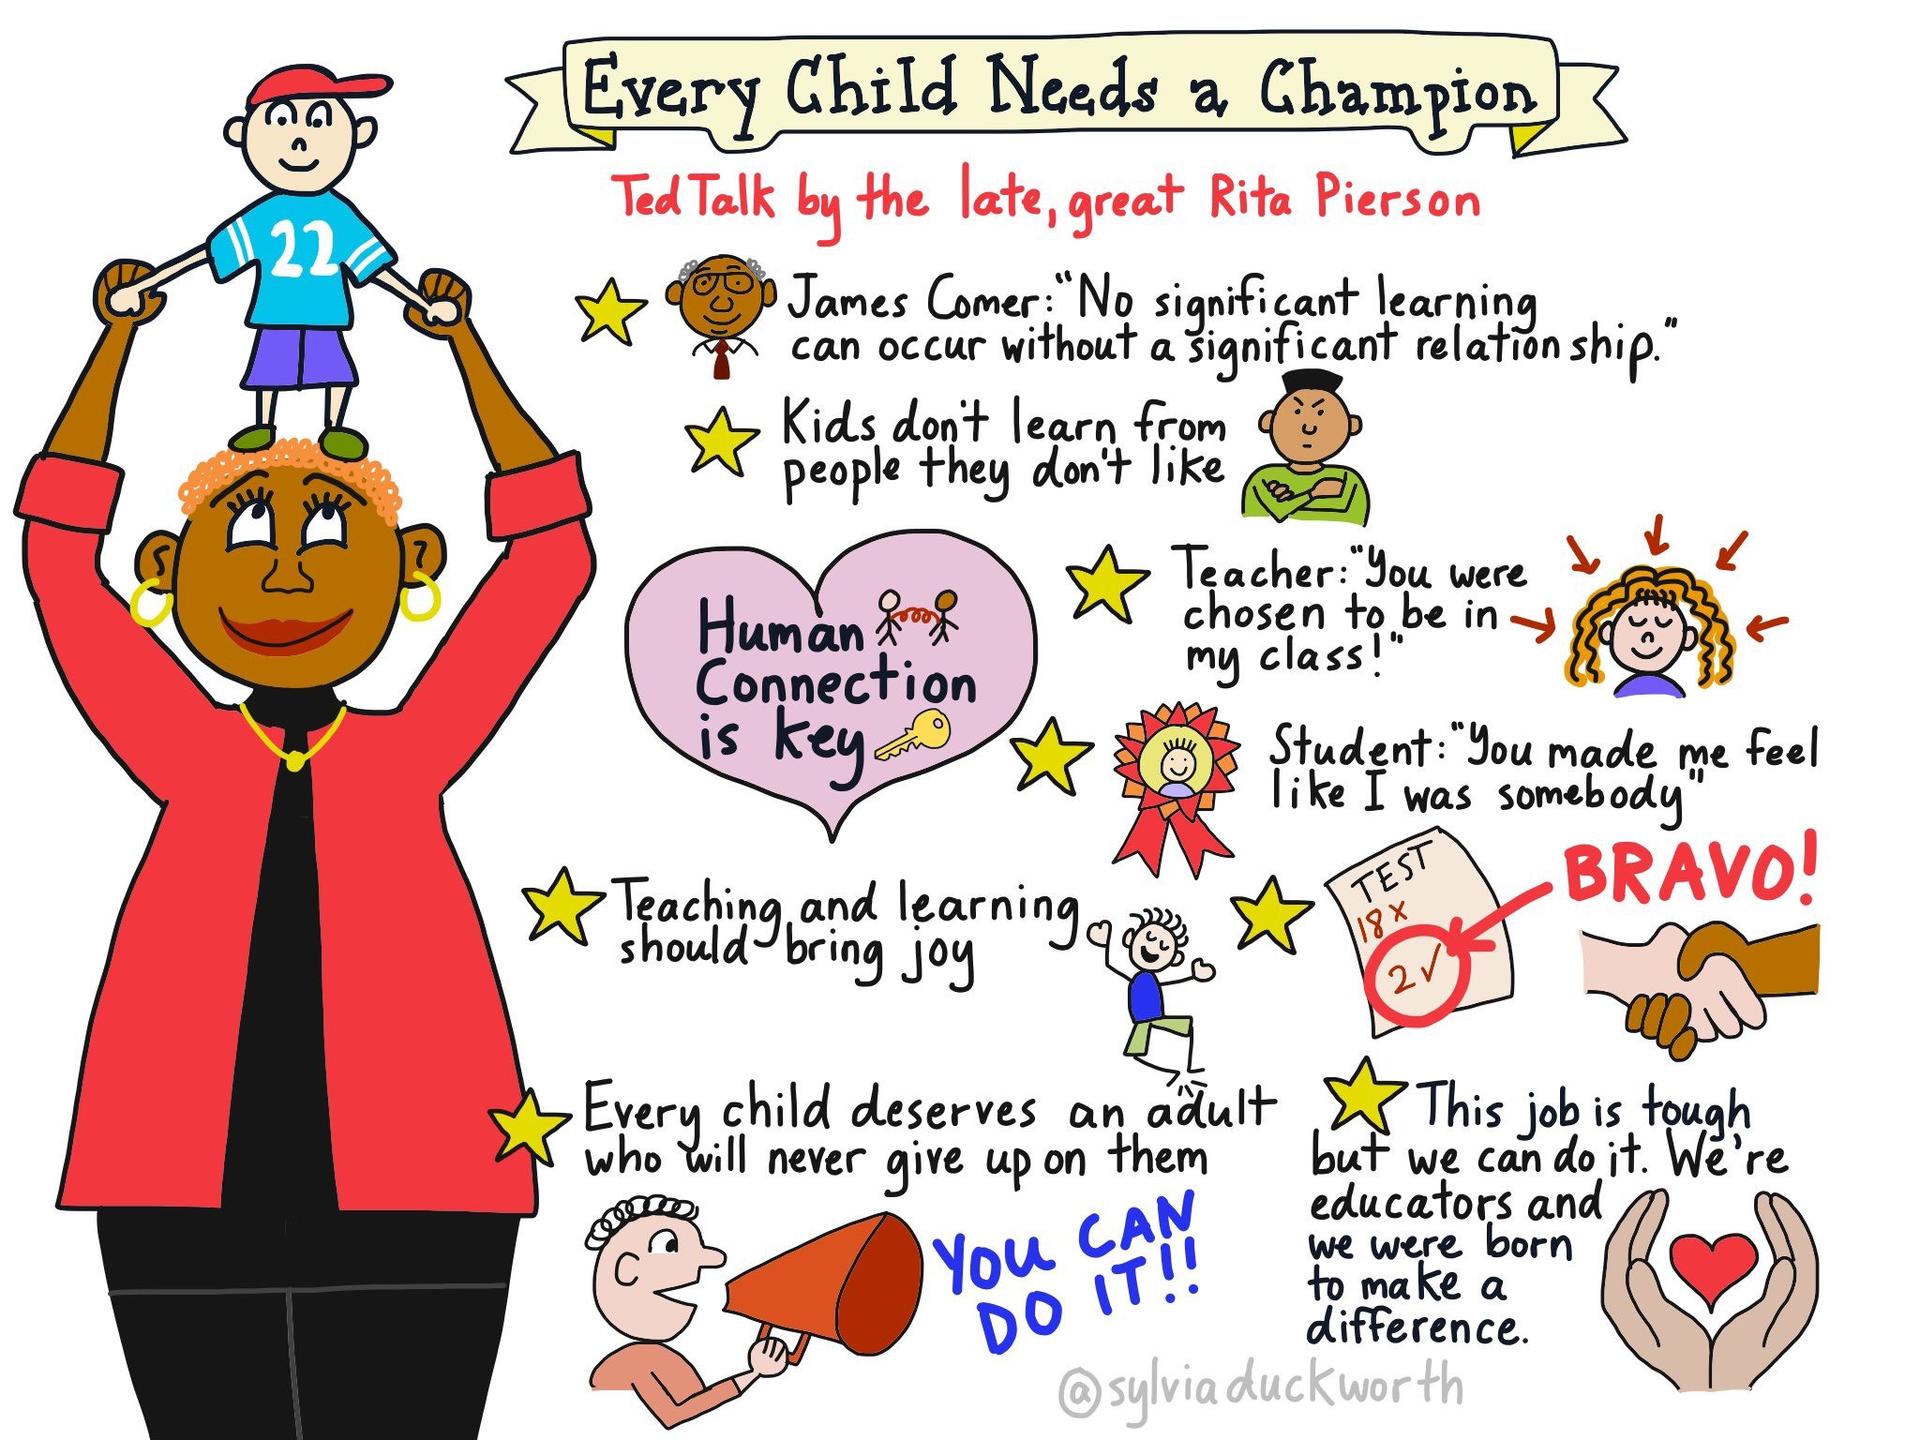 Every Child Needs A Champion